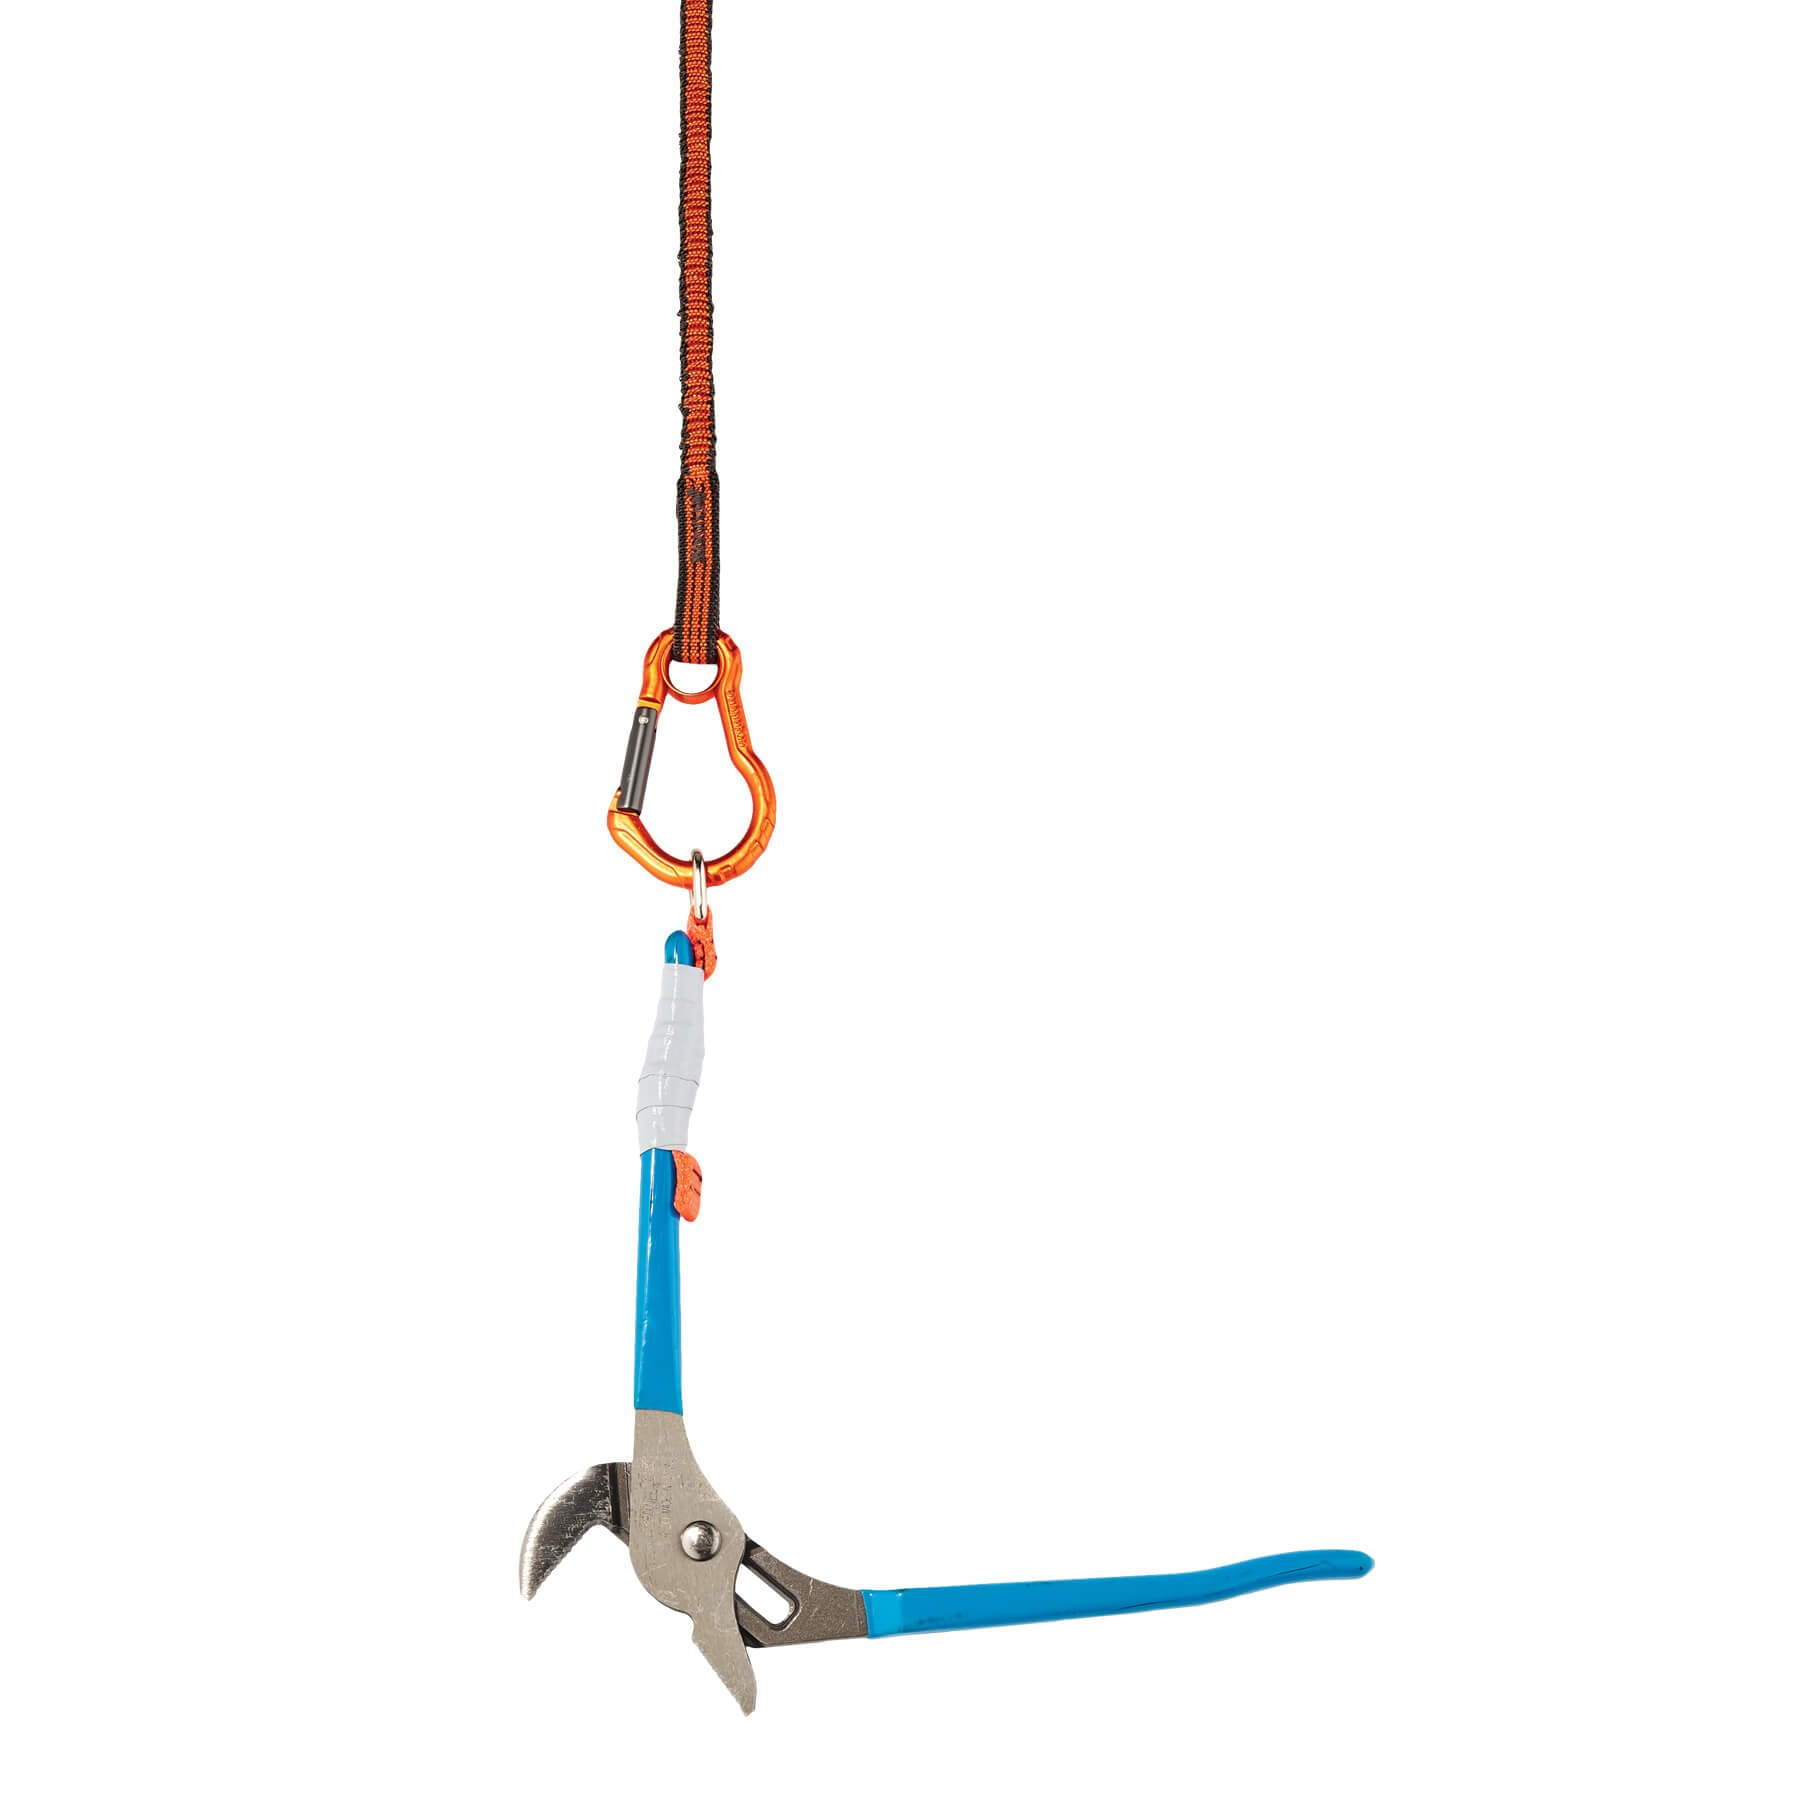 Ergodyne Squids 3110F(x) Shock Absorbing Tool Lanyard with Dual Aluminum Carabiners, 10 Pounds by Ergodyne (Image #3)